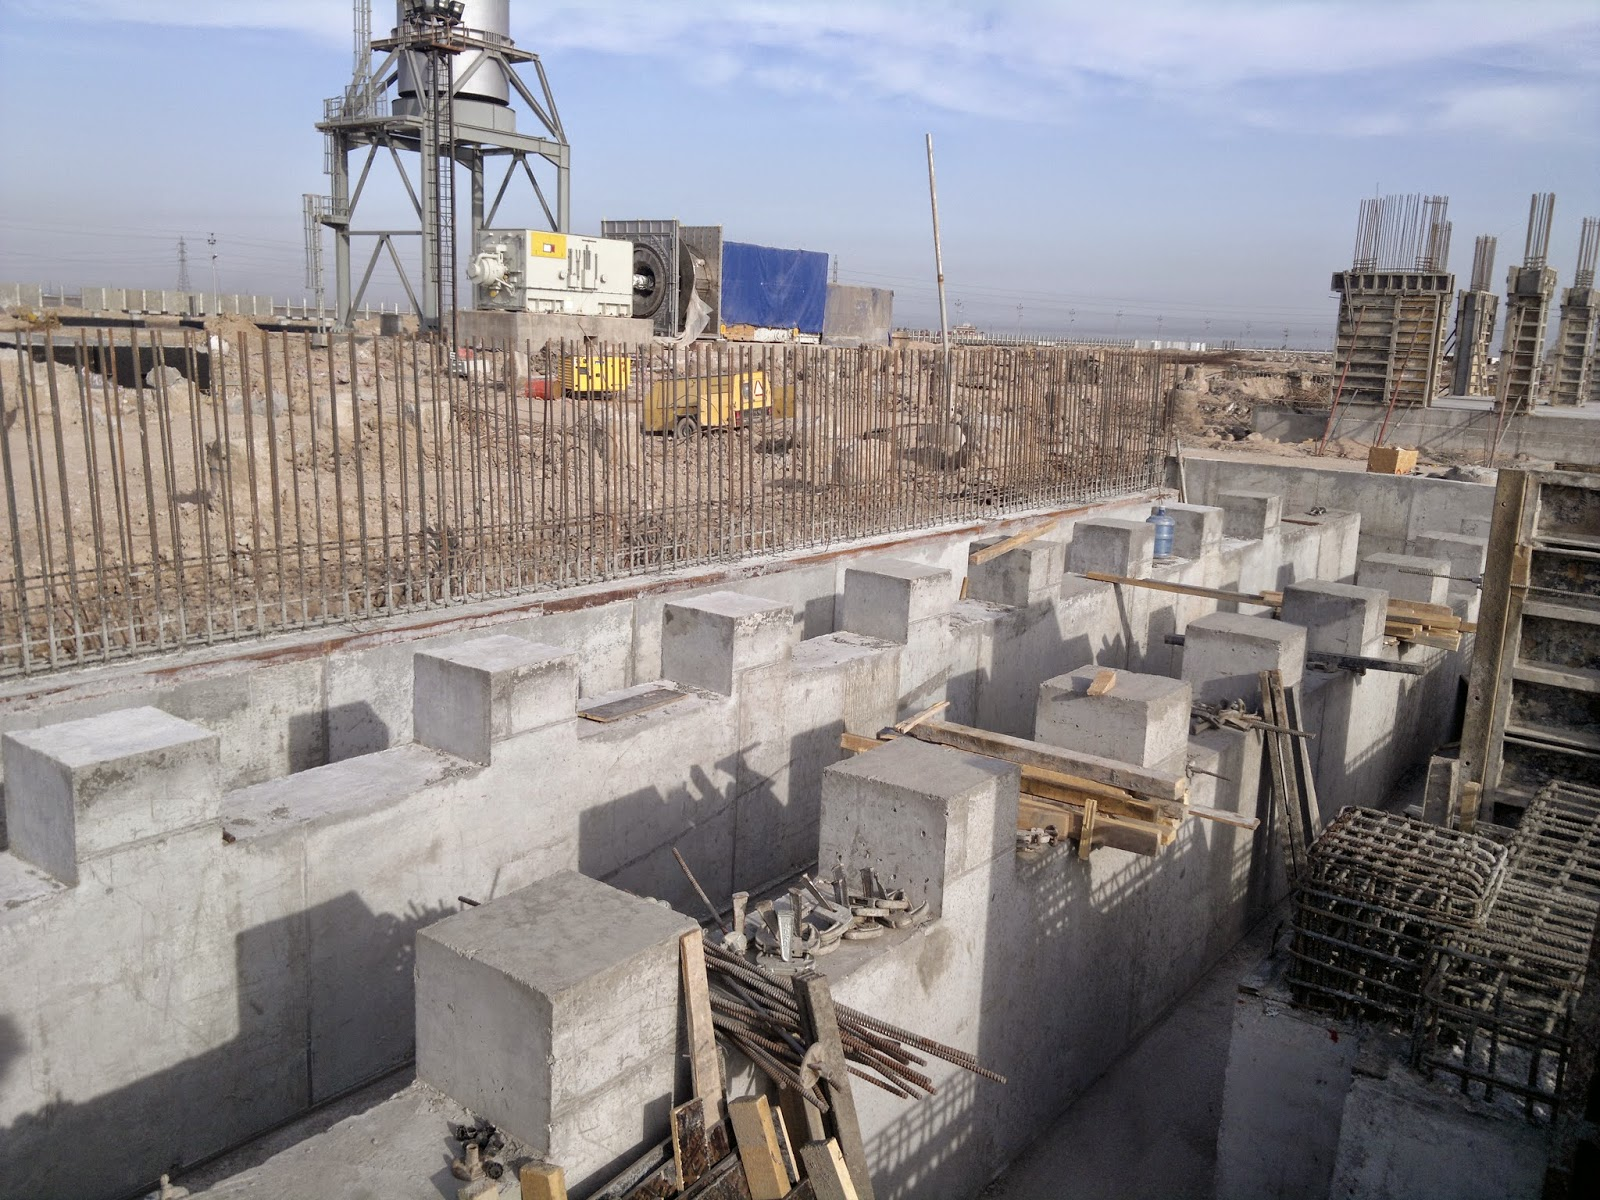 Octagon Contracting & Engineering : OCTAGON is building